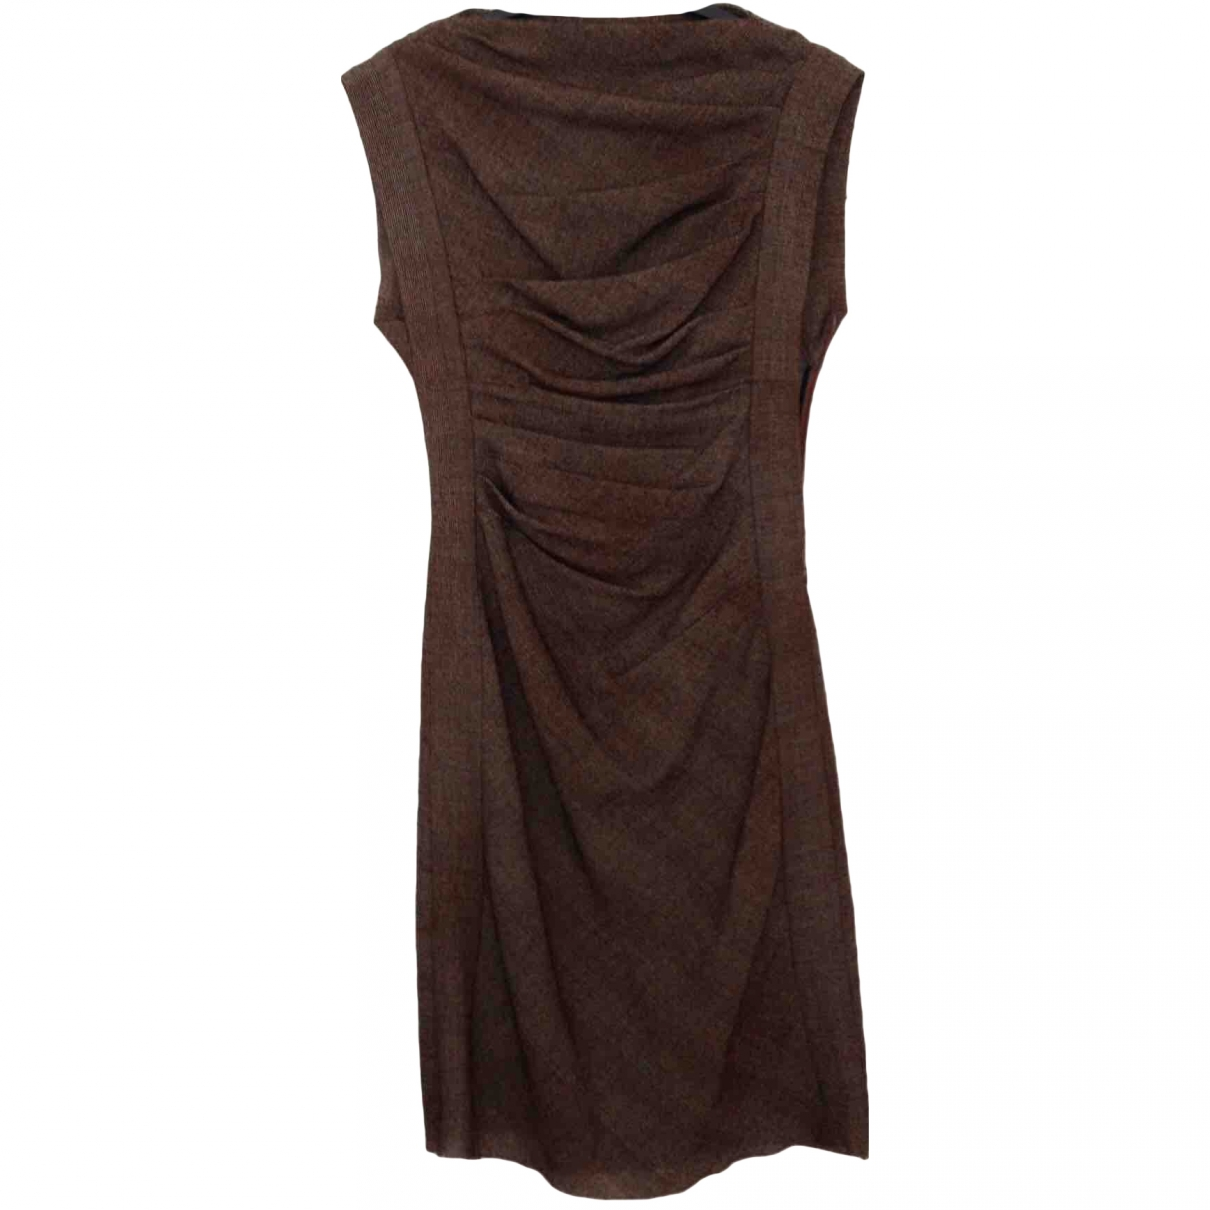 Bottega Veneta \N Brown Wool dress for Women 38 IT